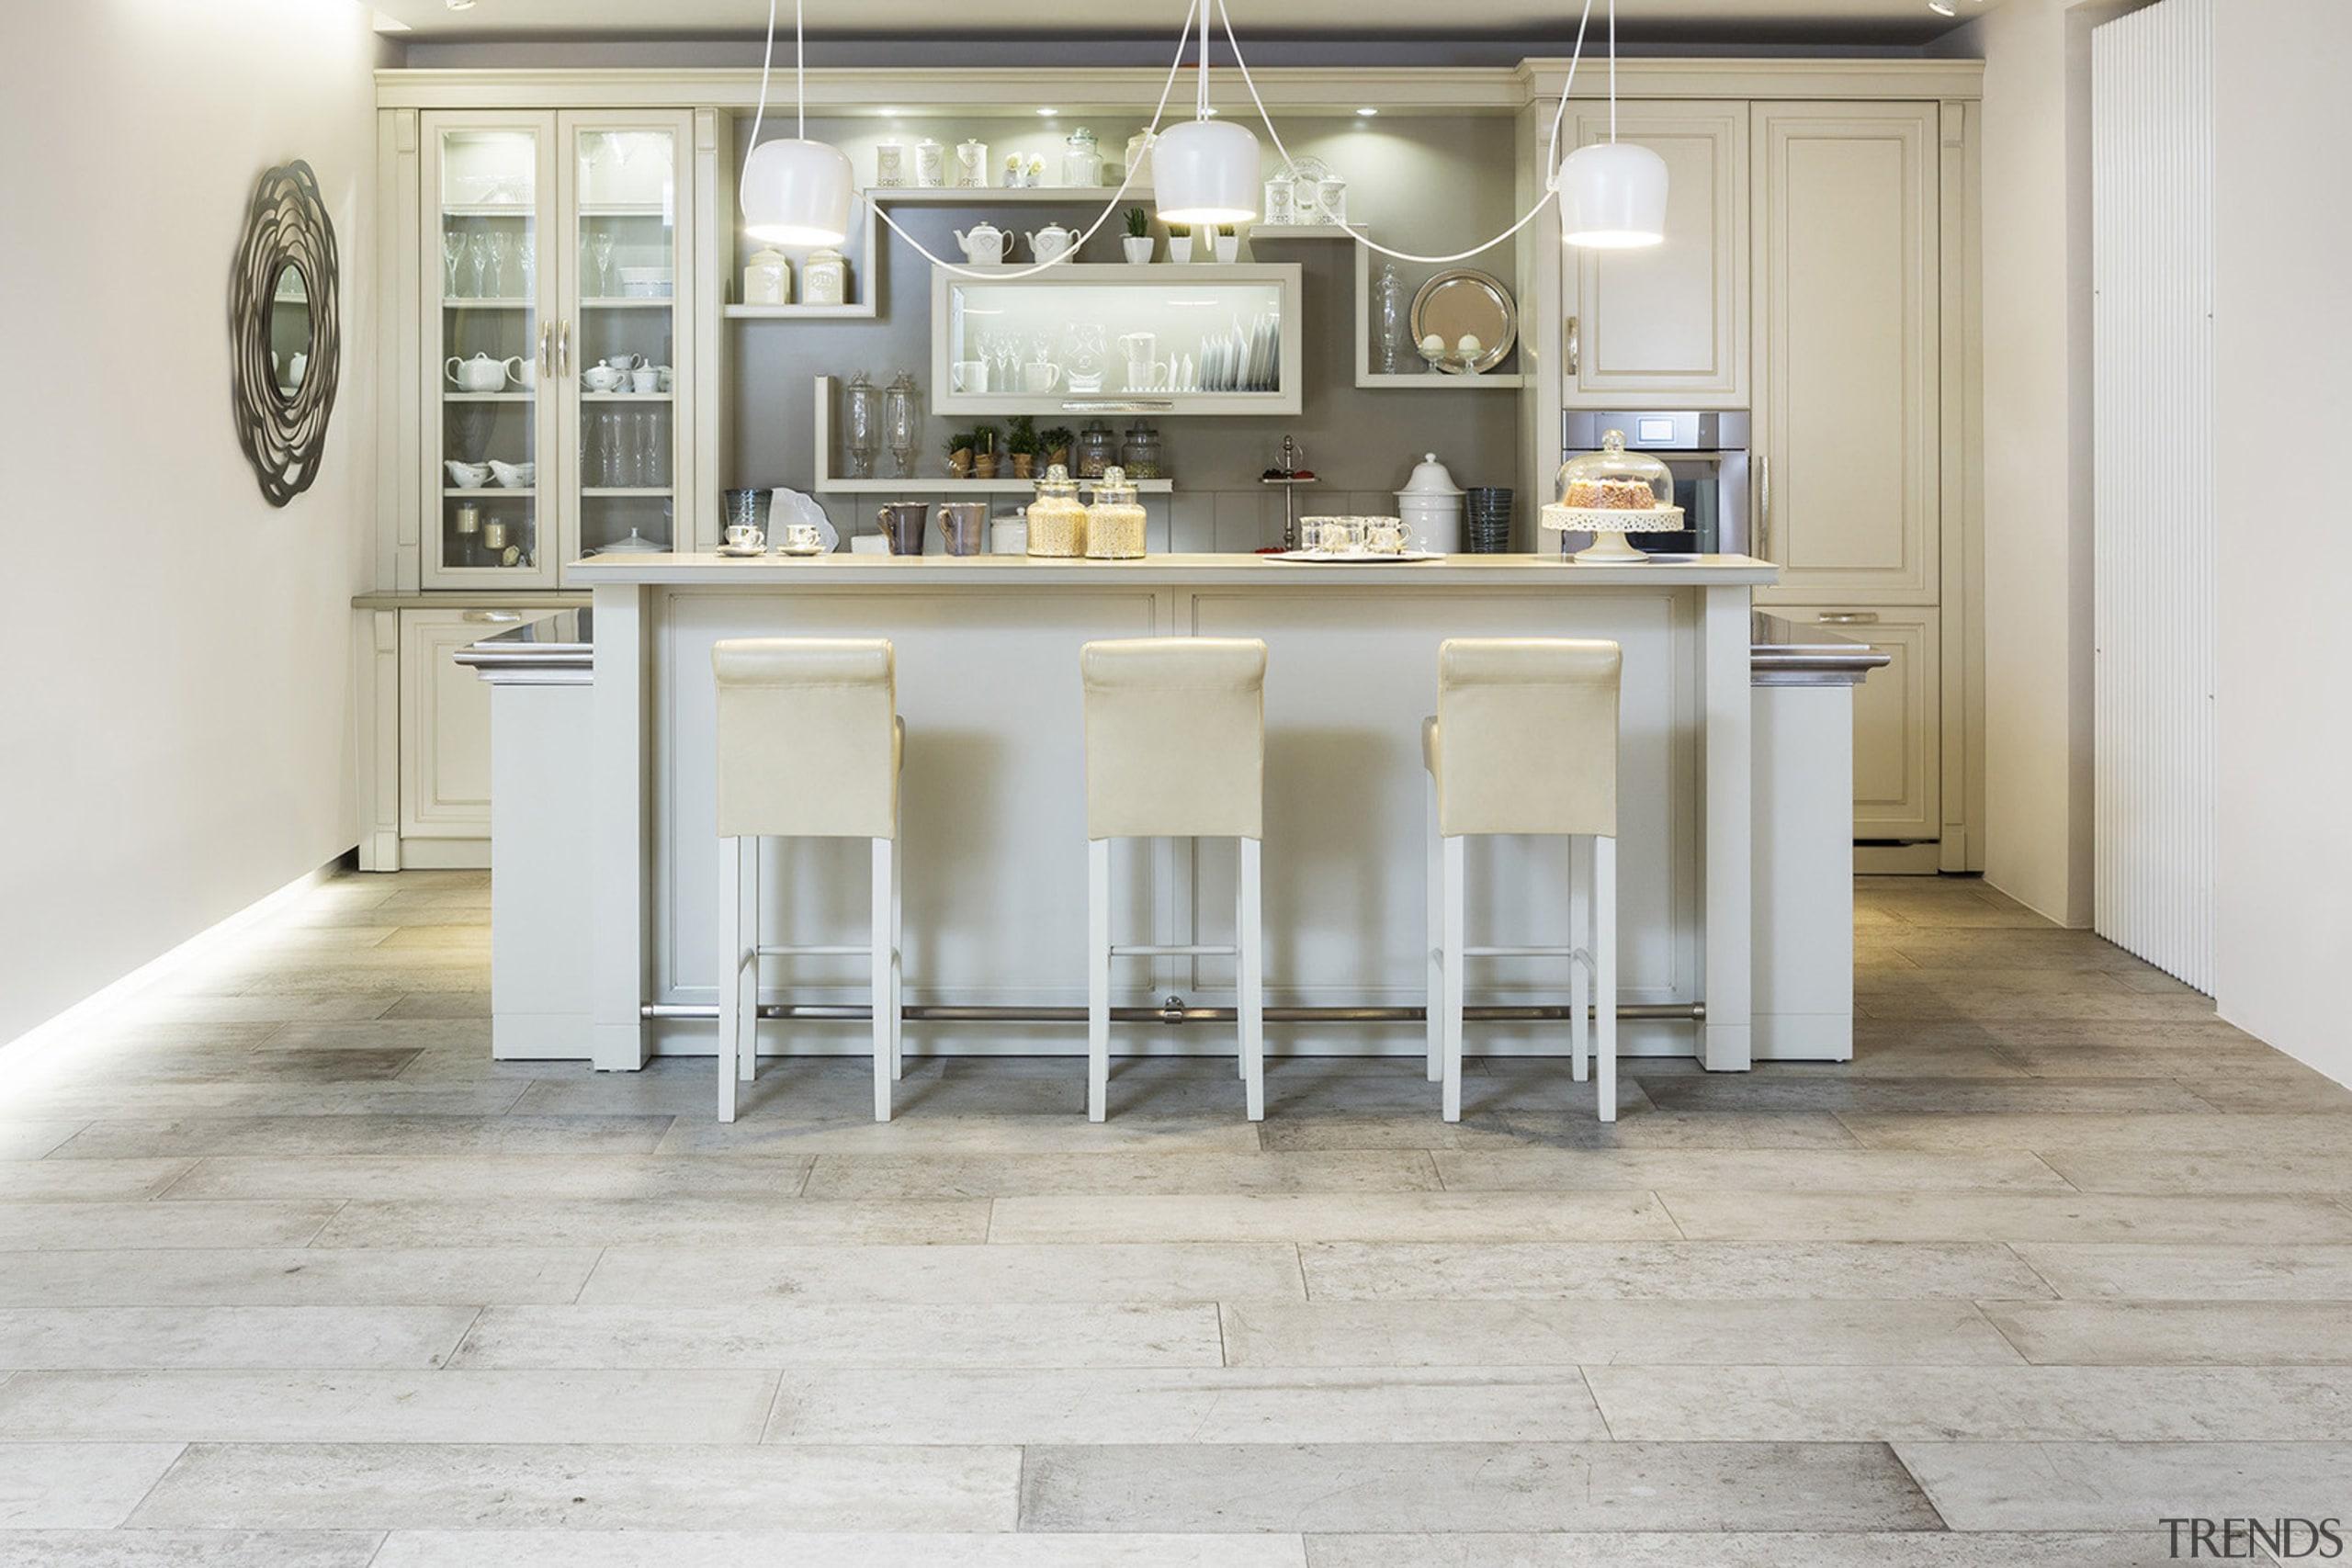 Circle kitchen - Circle kitchen - cuisine classique cuisine classique, floor, flooring, furniture, hardwood, interior design, kitchen, laminate flooring, table, tile, wood, wood flooring, gray, white